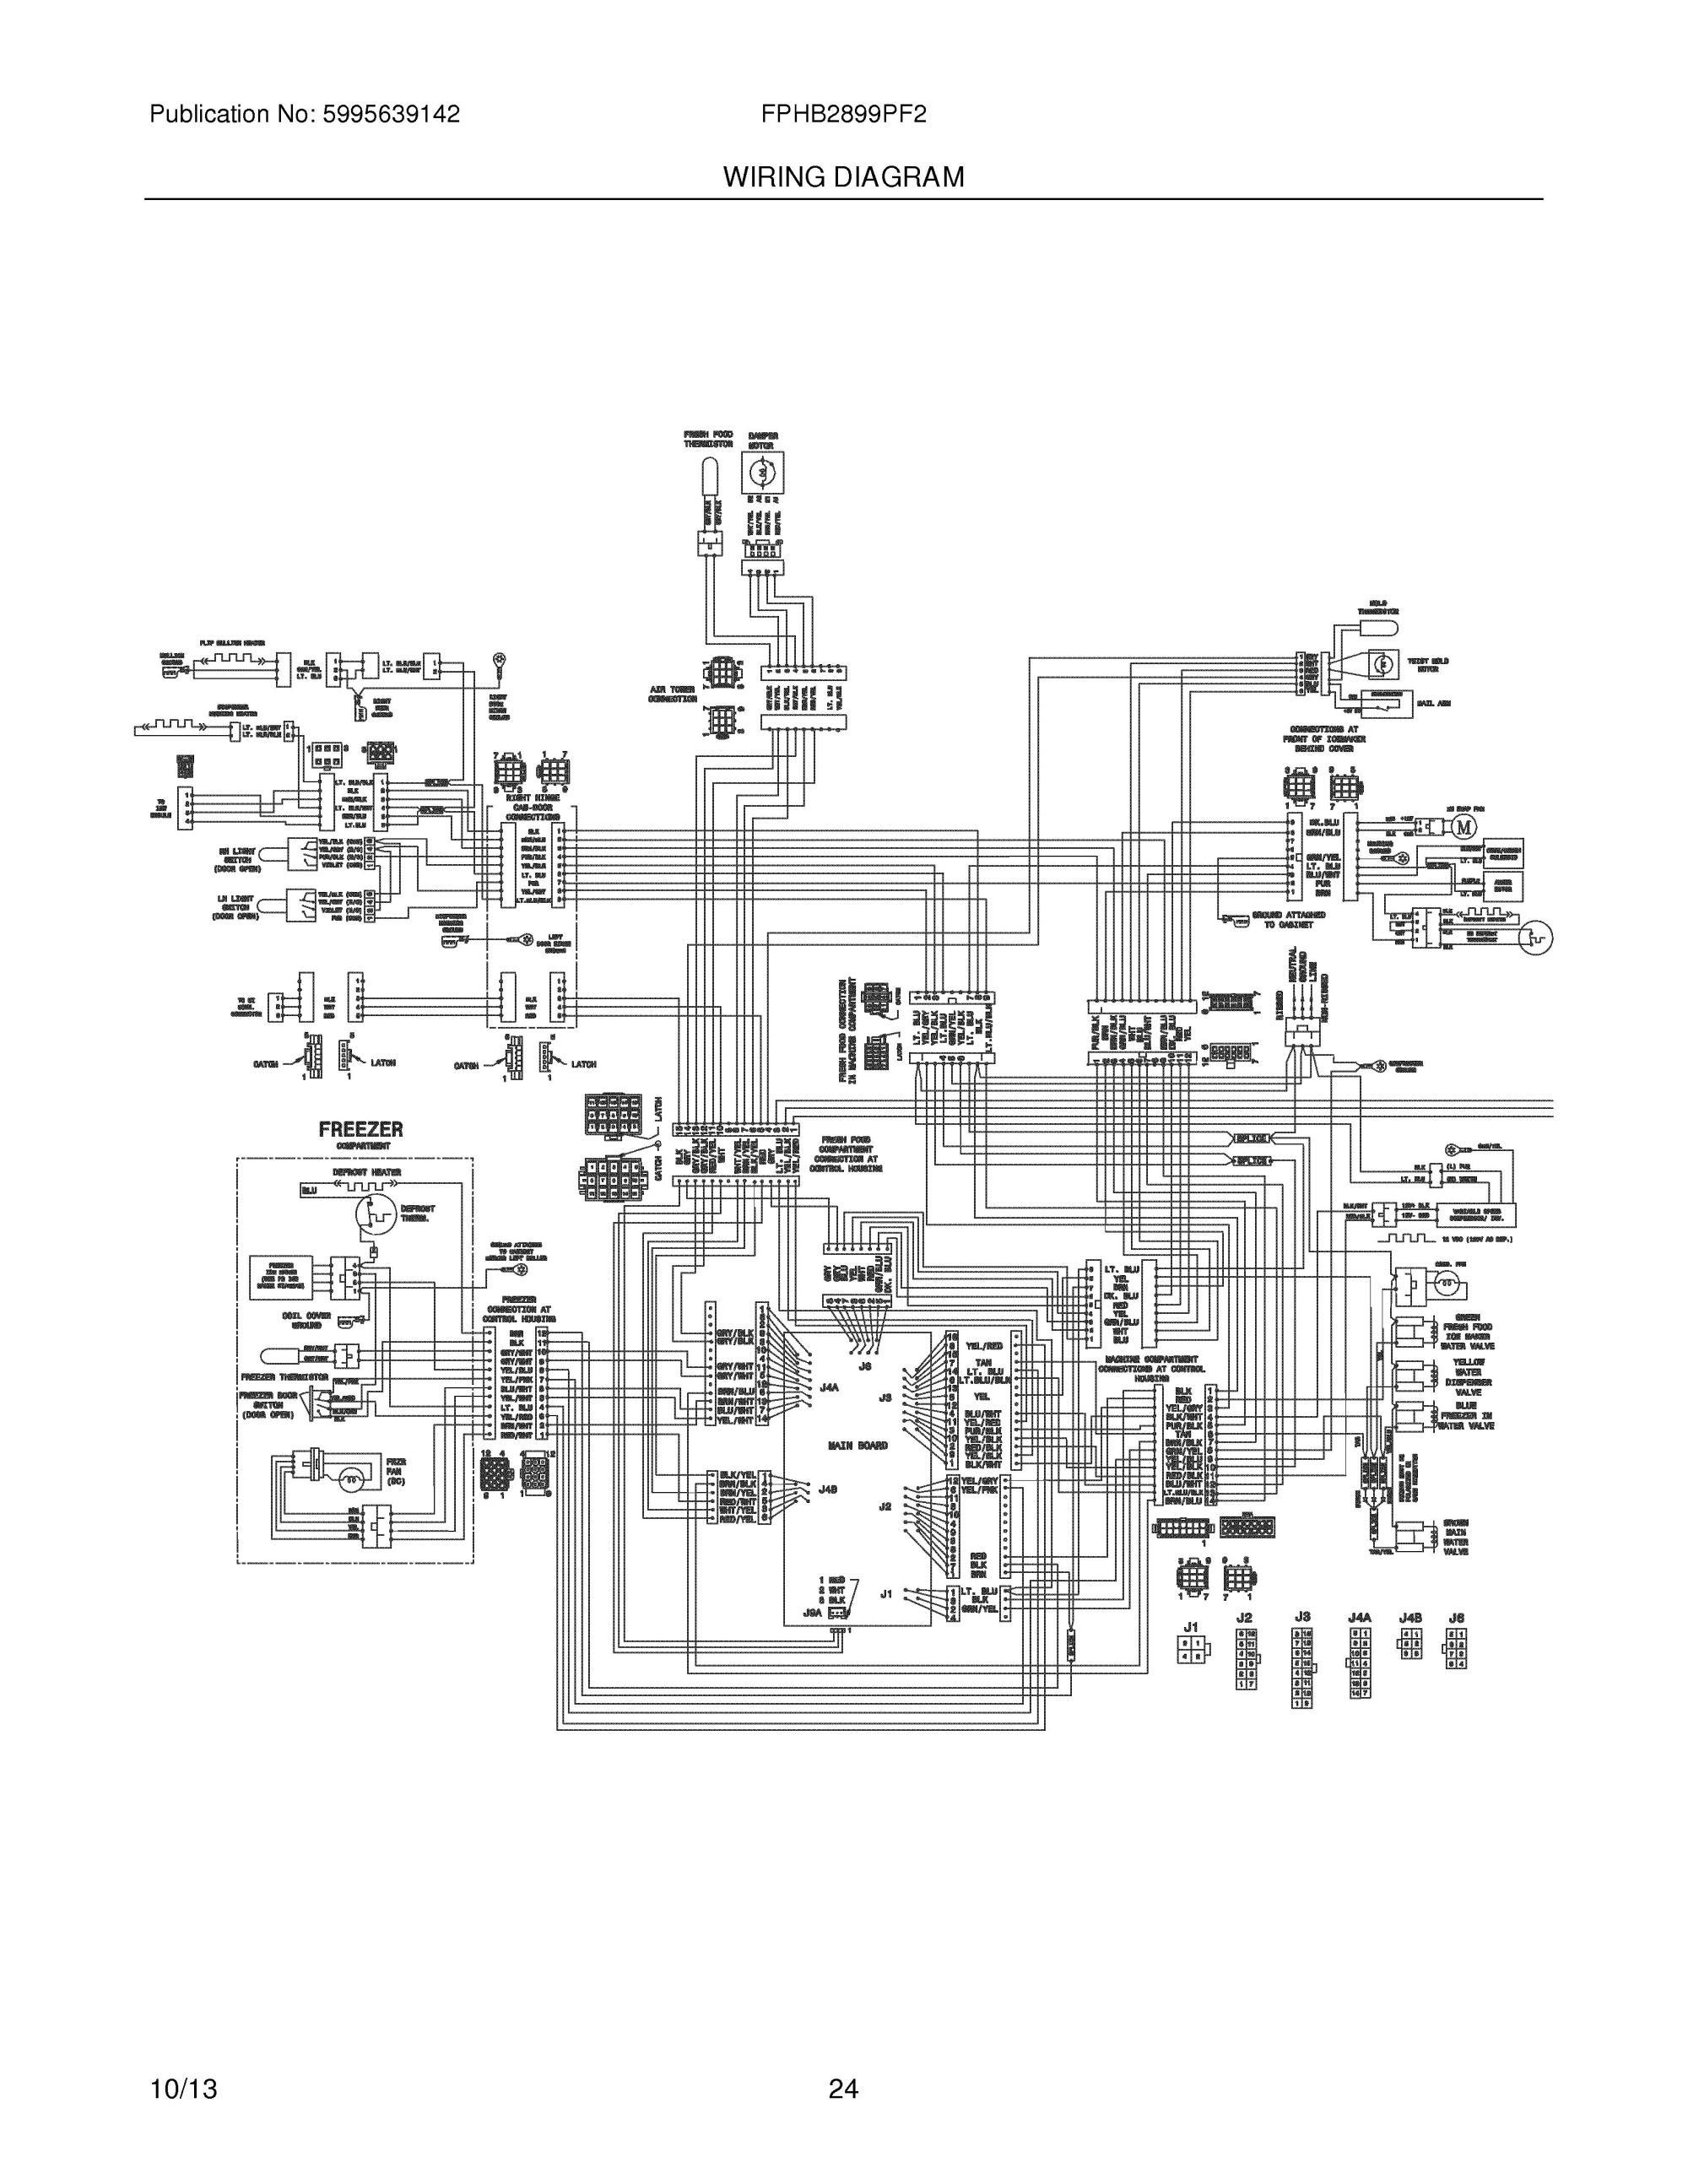 hight resolution of pin trailer connector wiring diagram images pin trailer wiring hose diagram garbage disposal dishwasher wiring